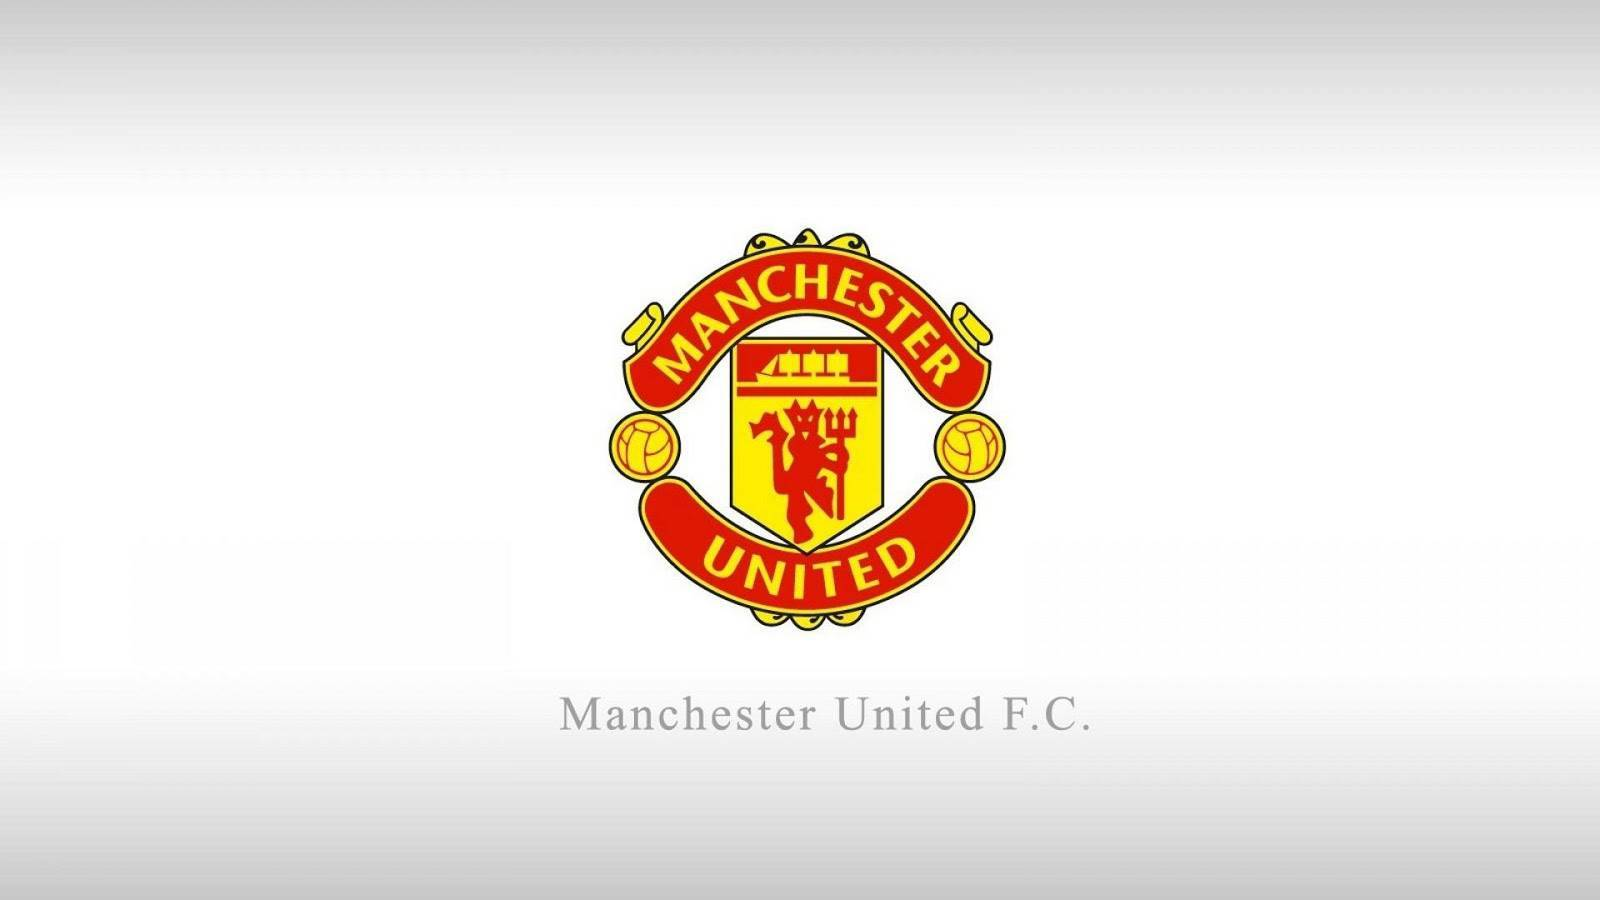 Man Utd Hd Logo Wallapapers For Desktop 2020 Collection Man Utd Core